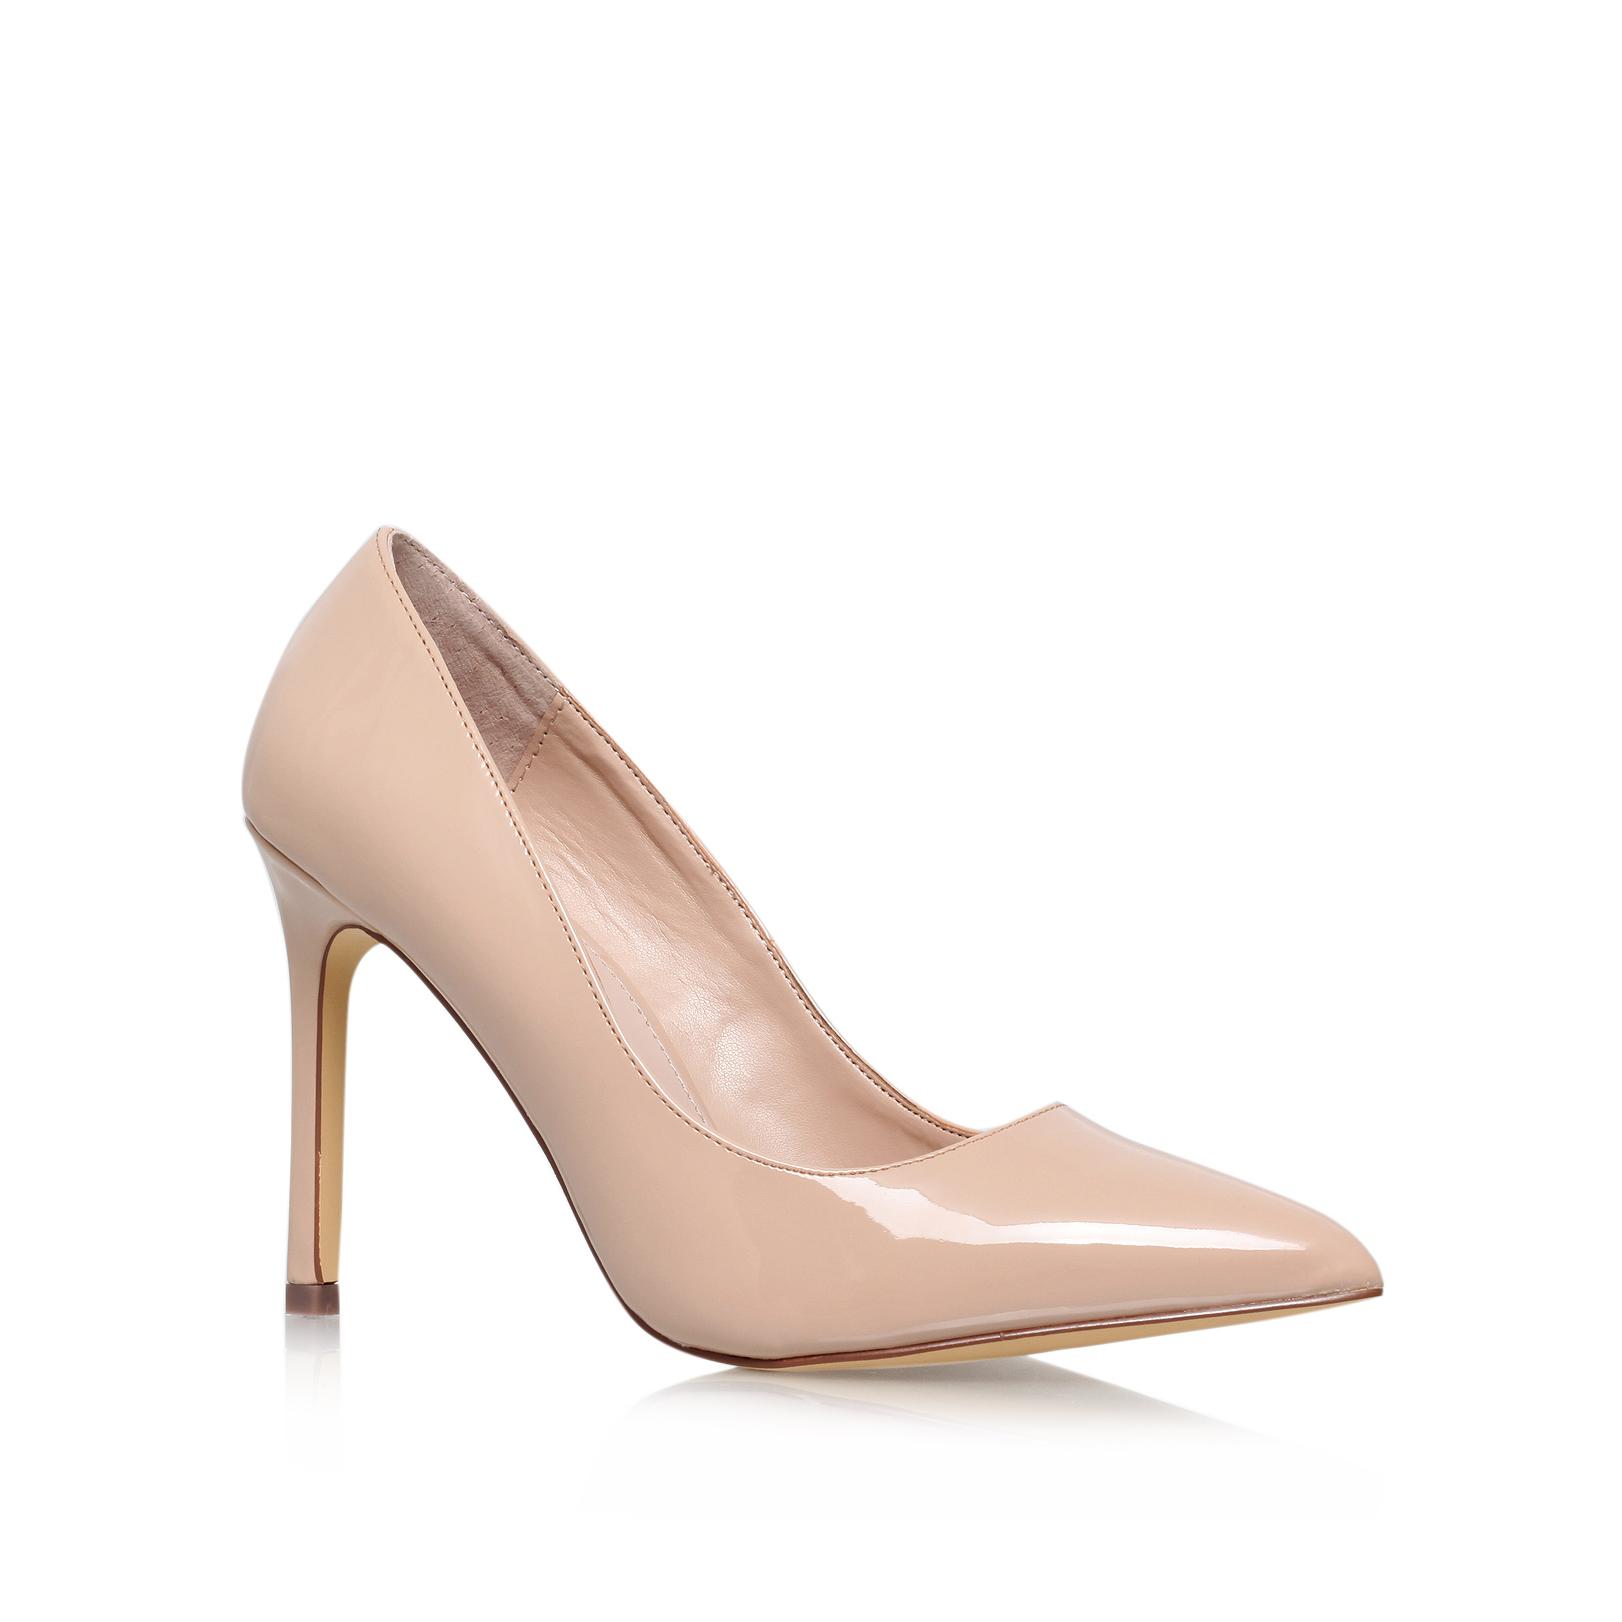 Carvela Shoes Nude Pink Heels